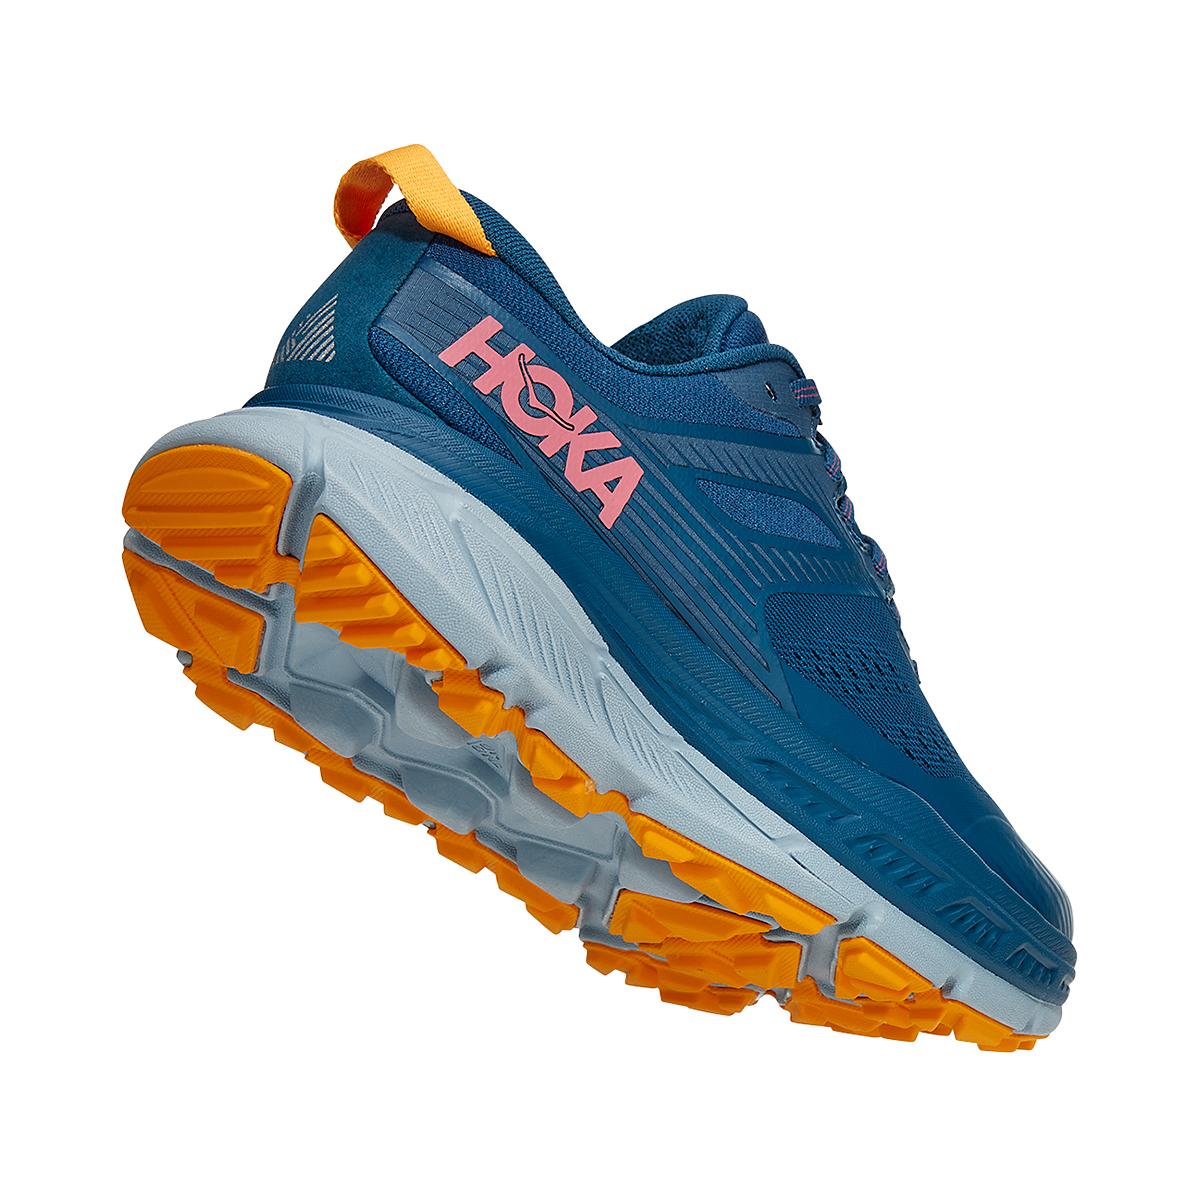 Women's Hoka One One Stinson ATR 6 Trail Running Shoe - Color: Moroccan Blue/Saffron - Size: 5 - Width: Regular, Moroccan Blue/Saffron, large, image 3